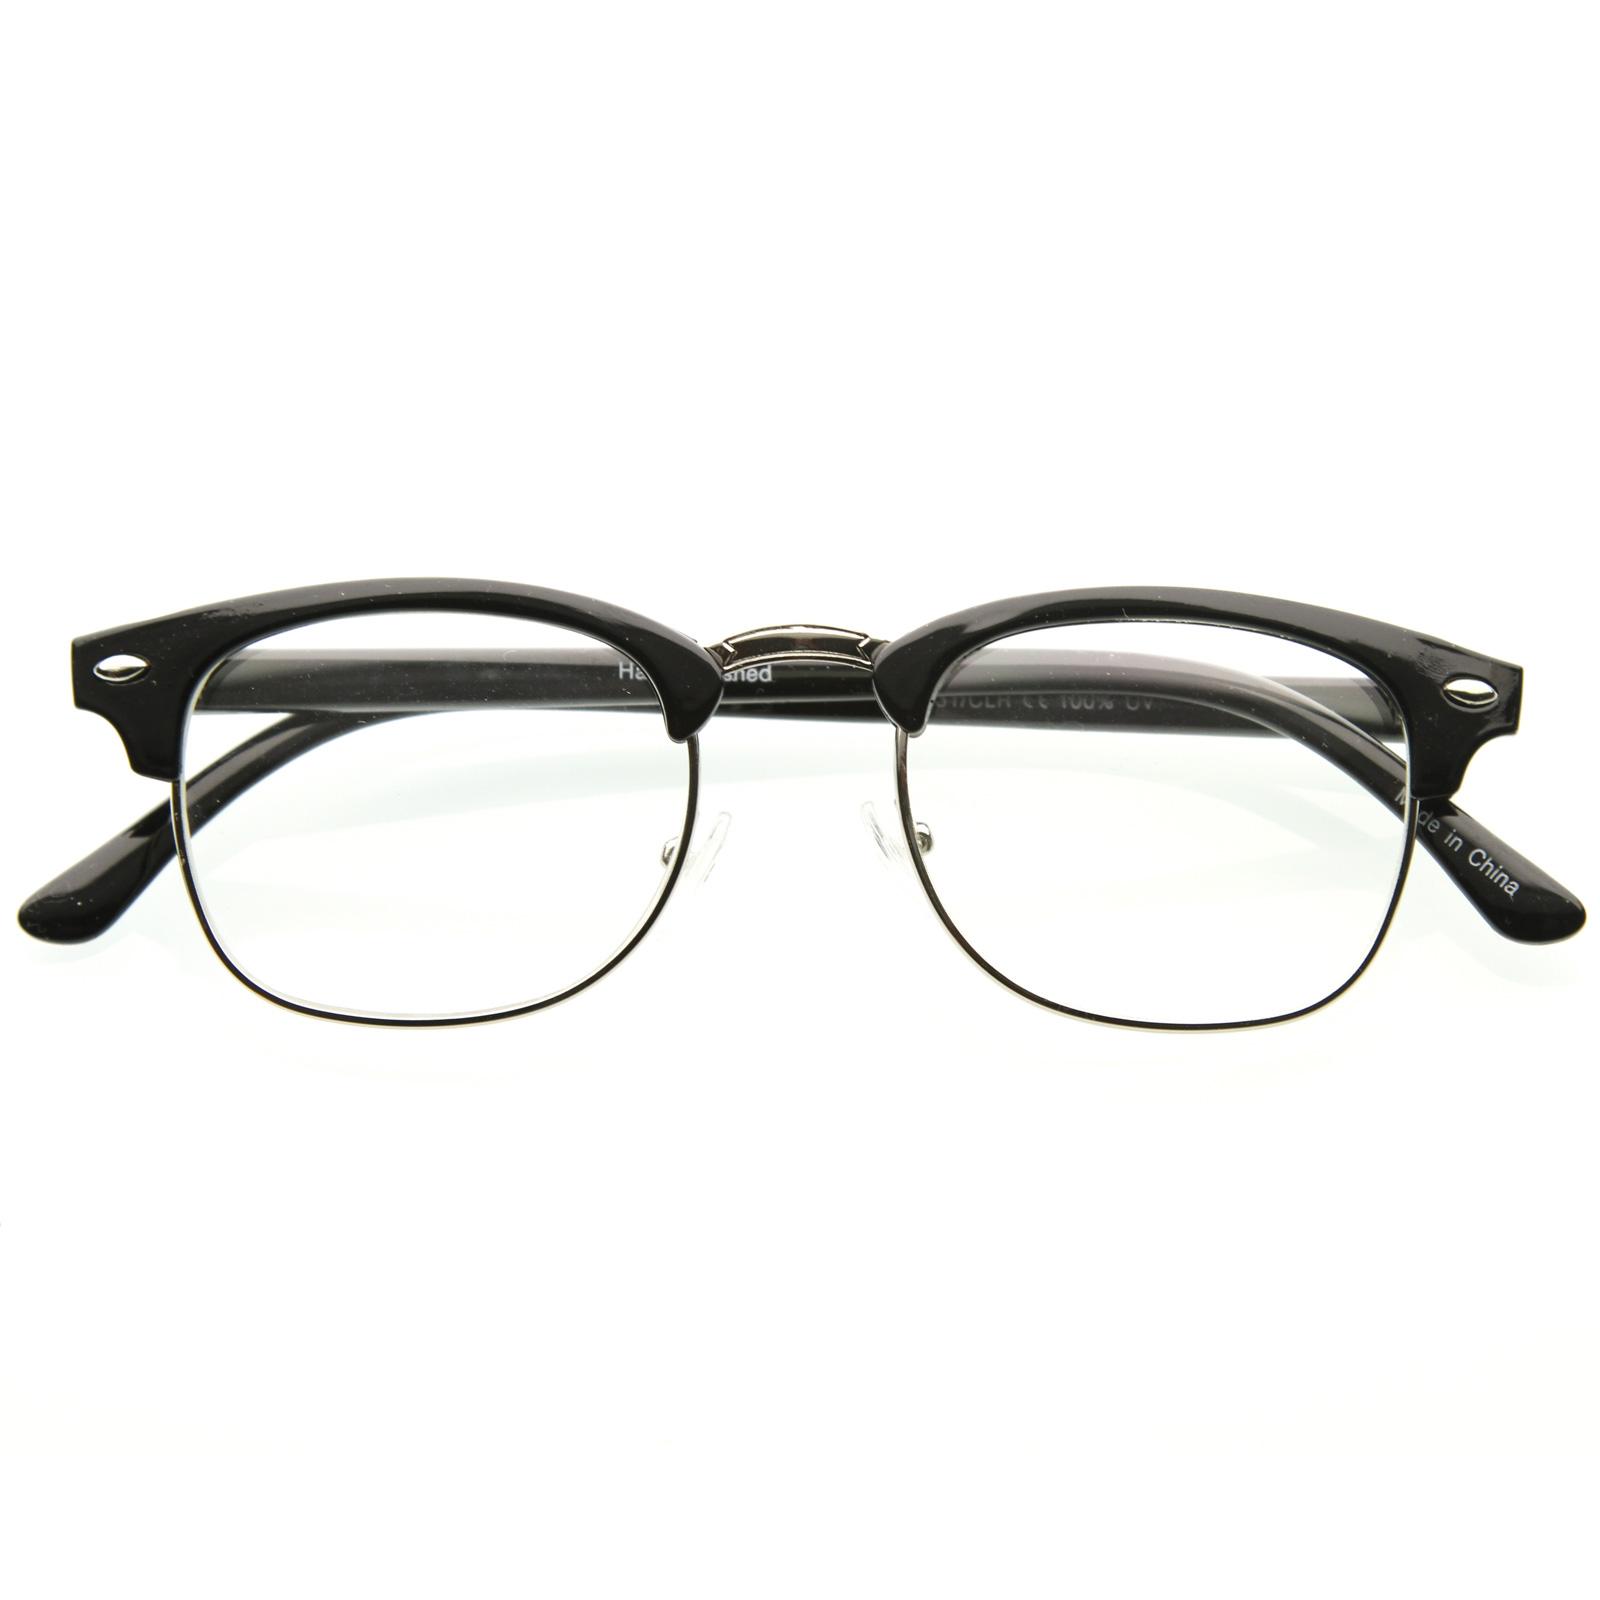 Half Frame Vintage Glasses : Unworn Original Vintage Half Frame Clubmasters Shades ...